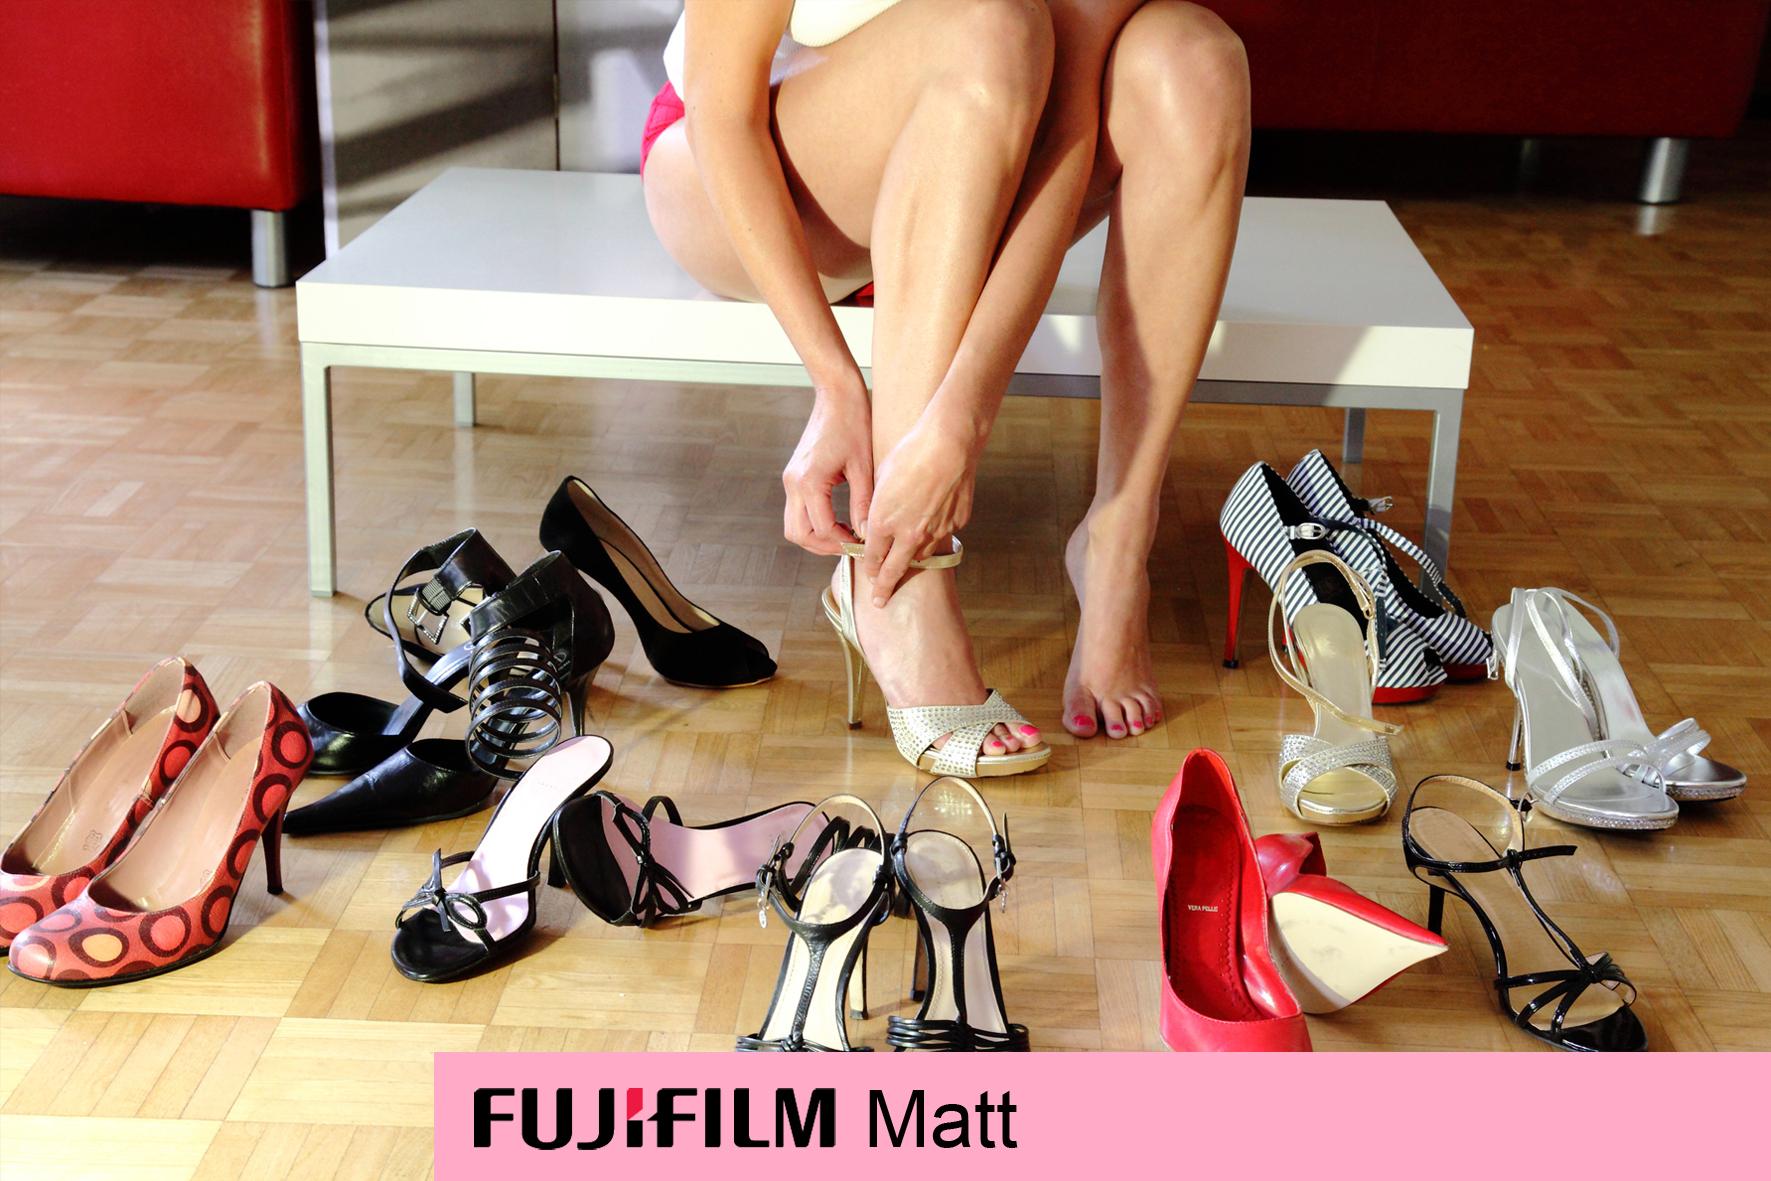 Примерка обуви фото 27 фотография